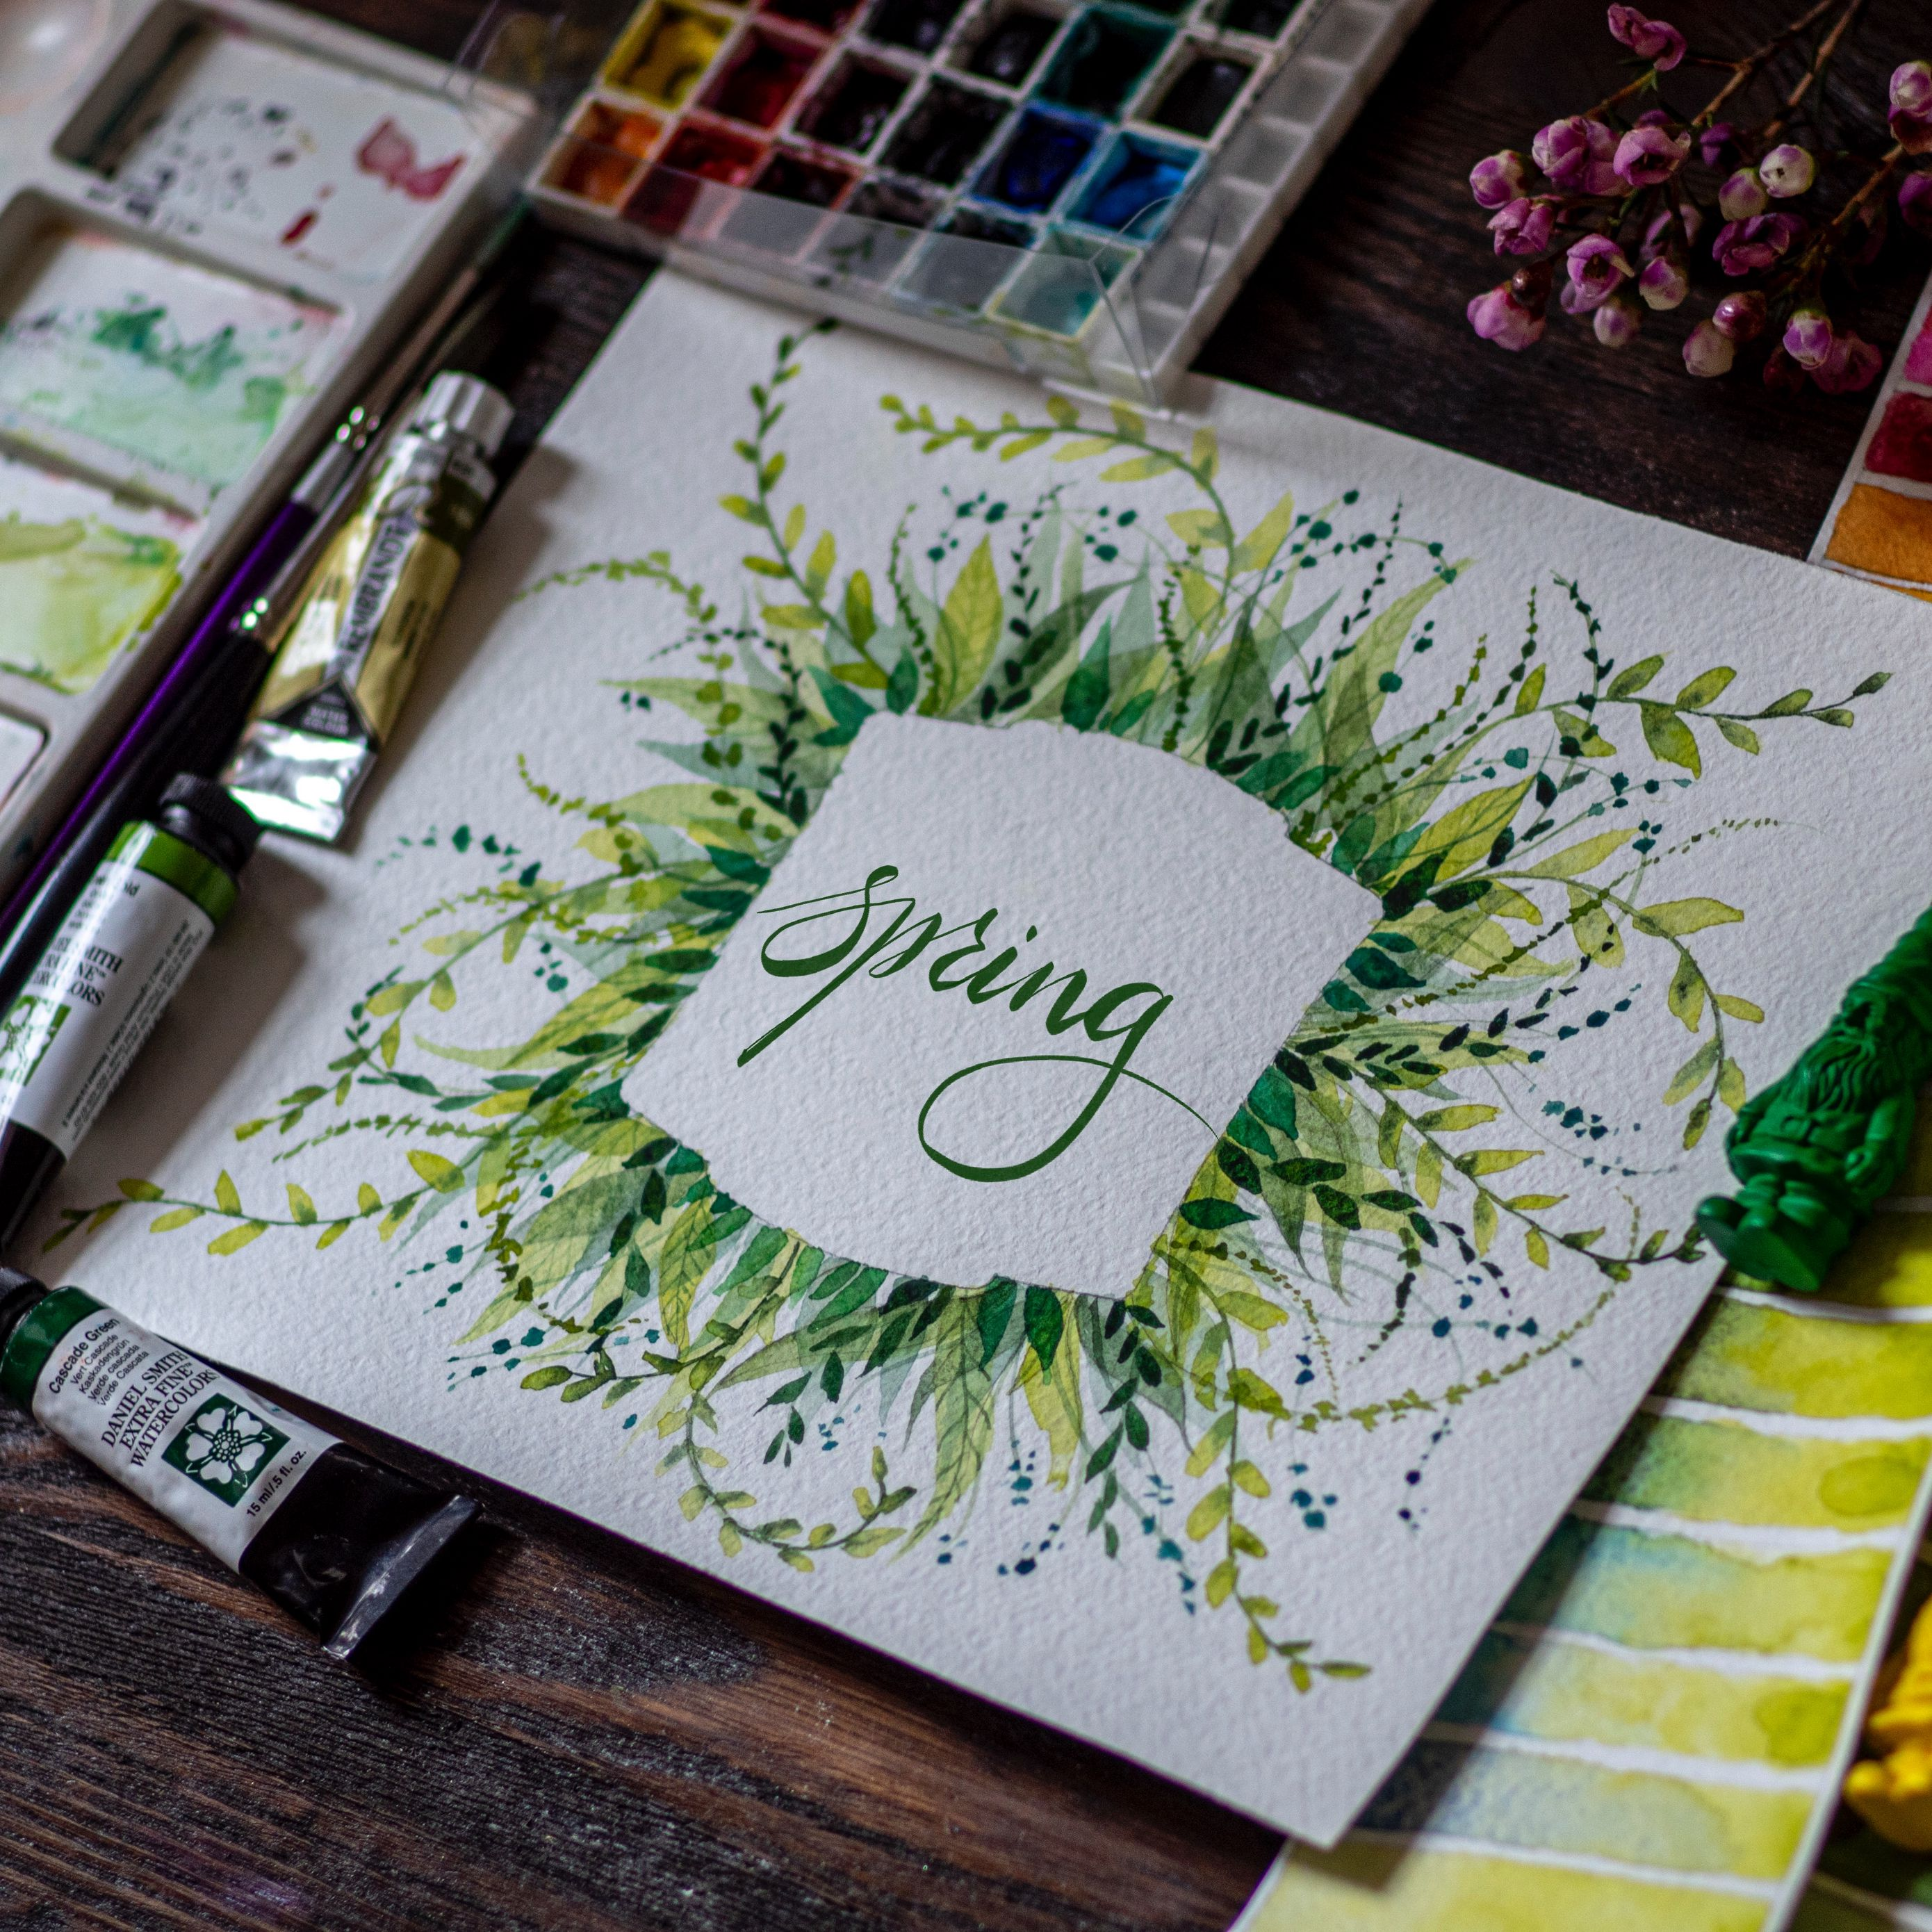 2780x2780 Обои весна, слово, леттеринг, краски, акварель